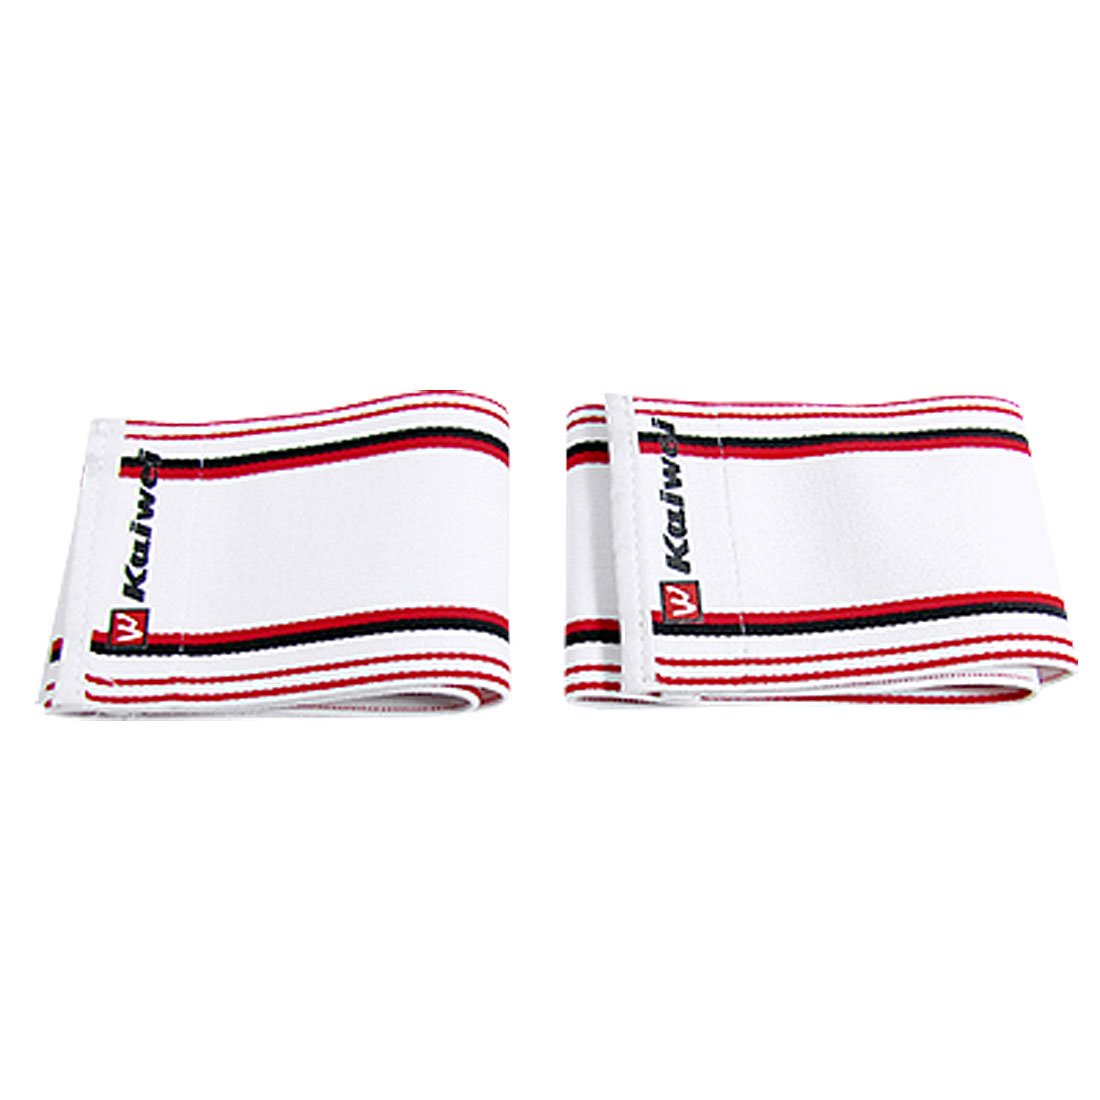 2 Pcs Detachable Closure Black Red Stripe Sports Wrist Support